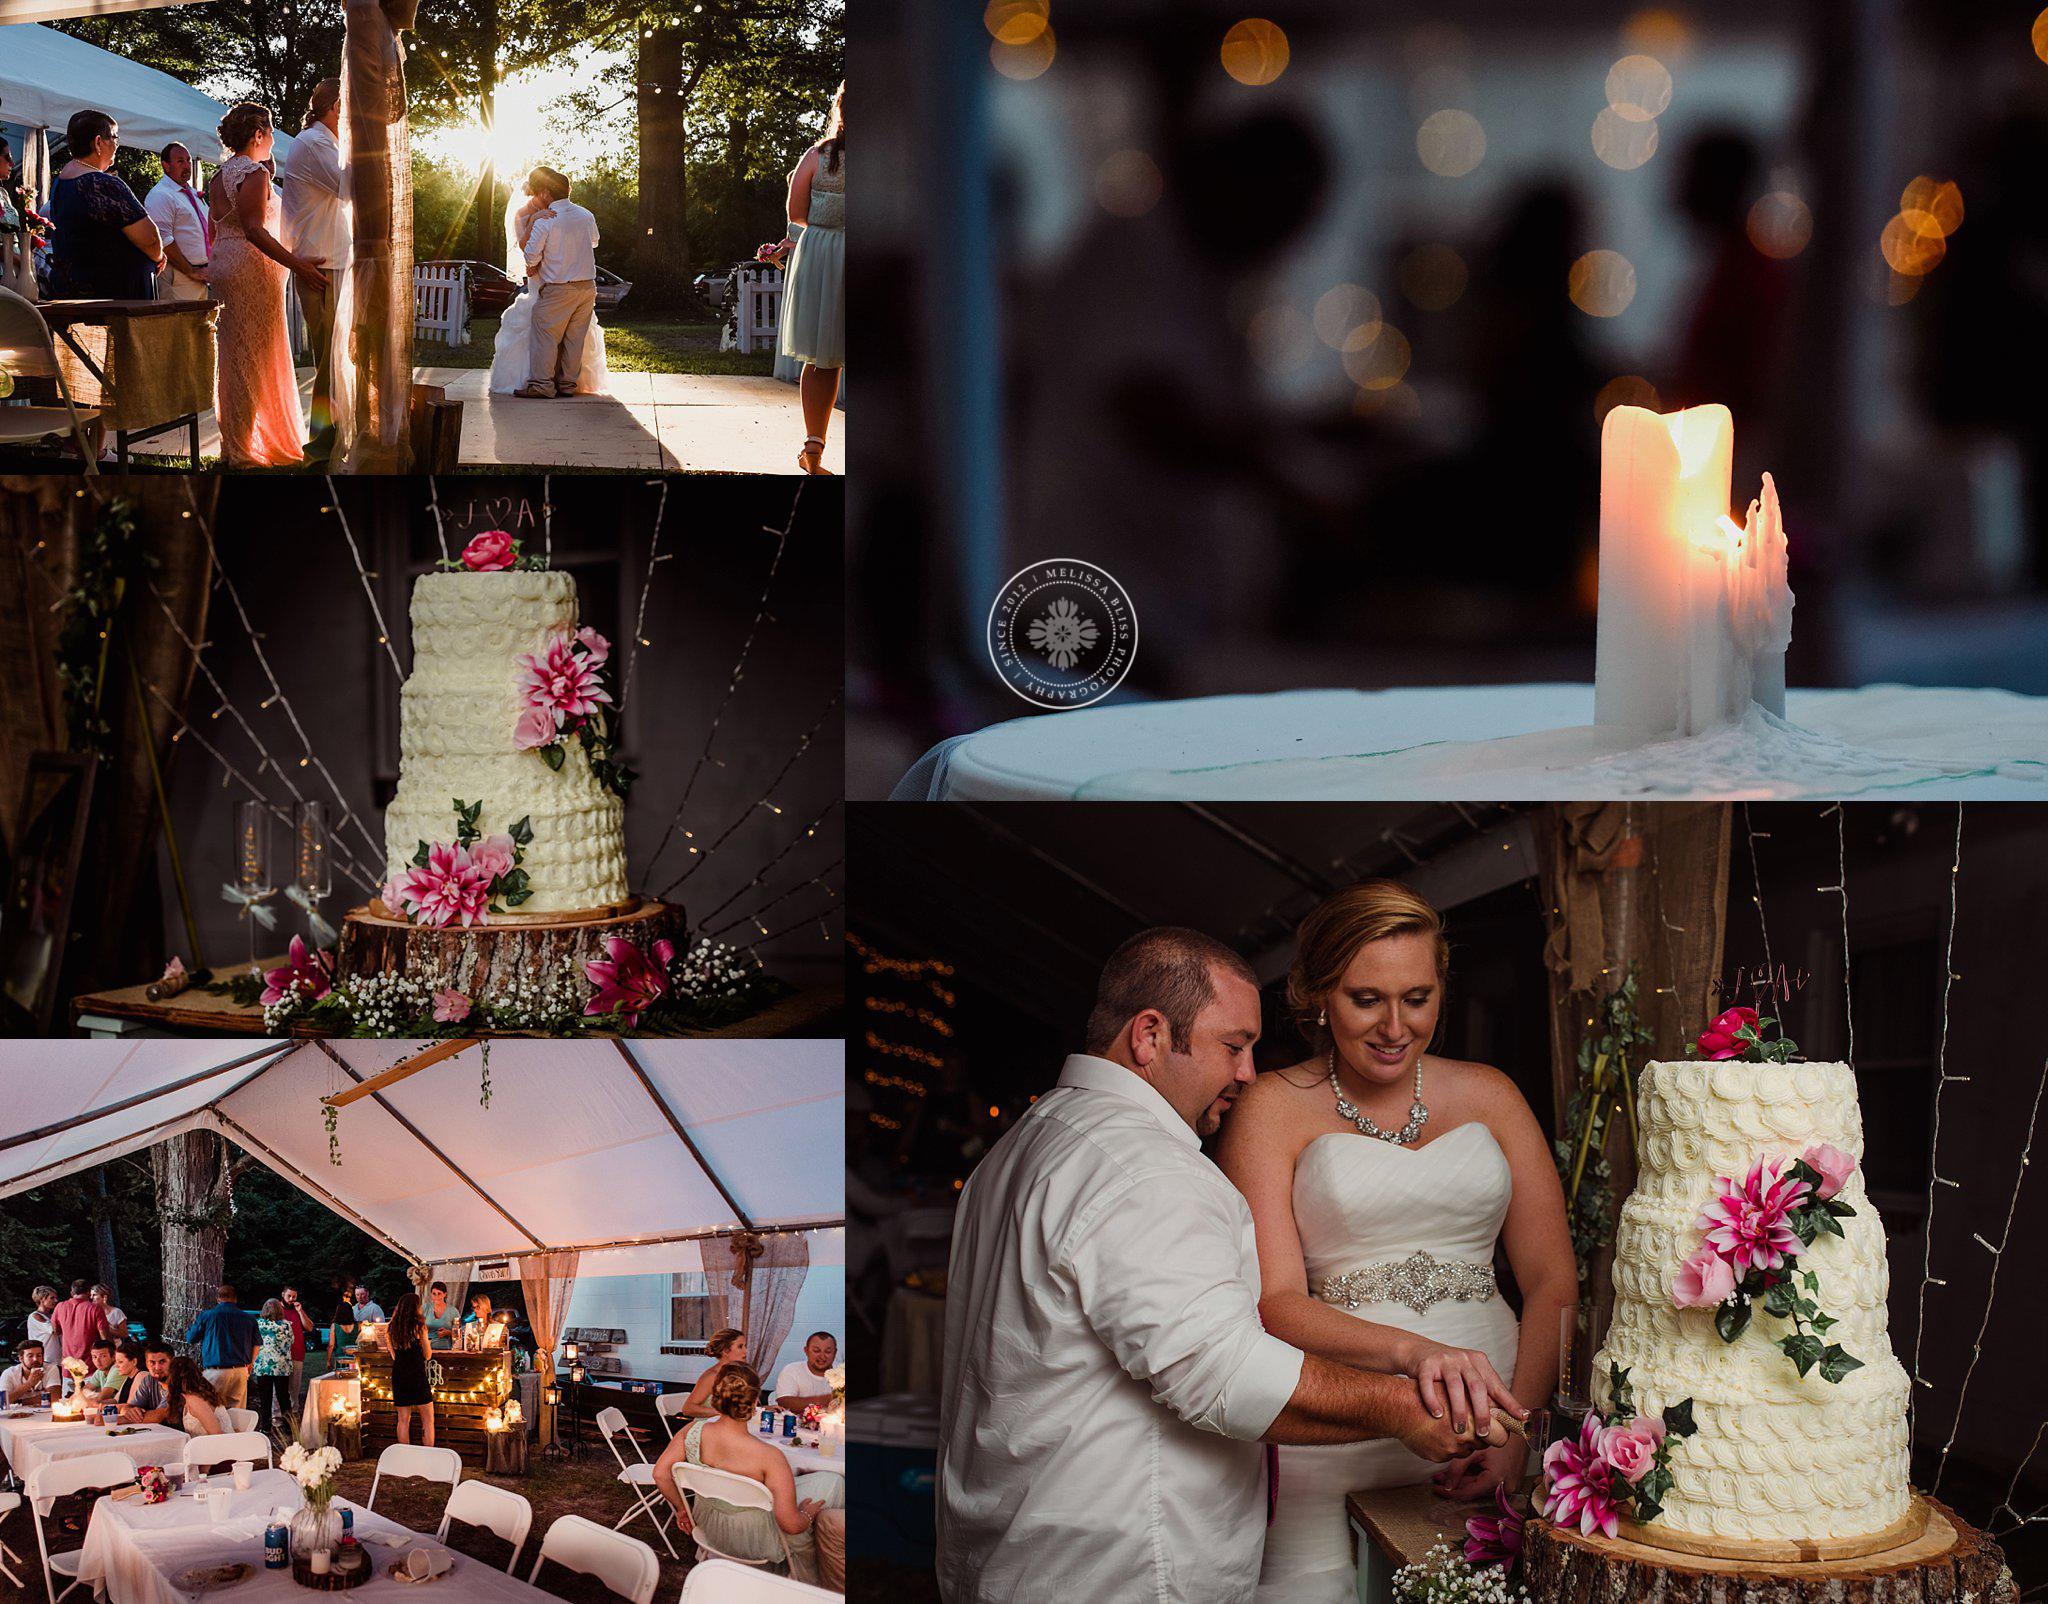 norfolk-portsmouth-virginia-beach-chesapeake-williamsburg-wedding-photographers-melissa-bliss-photography-top-wedding-photographers-hampton-roads-va-professional-wedding-photographer.jpg